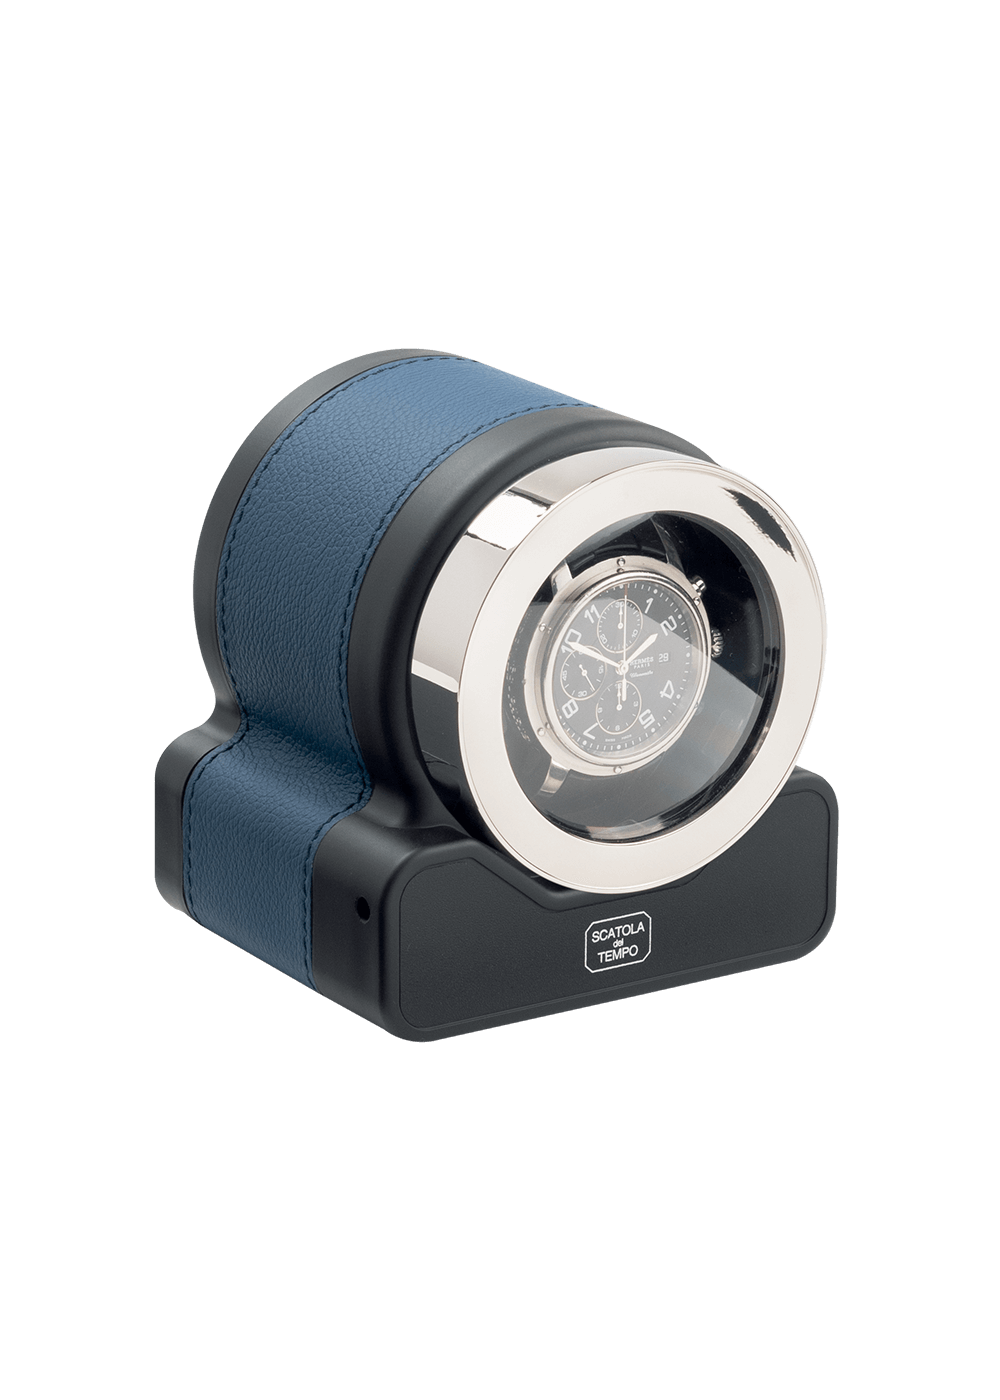 Scatola Del Tiempo Leder Blau Rotor One Zurich